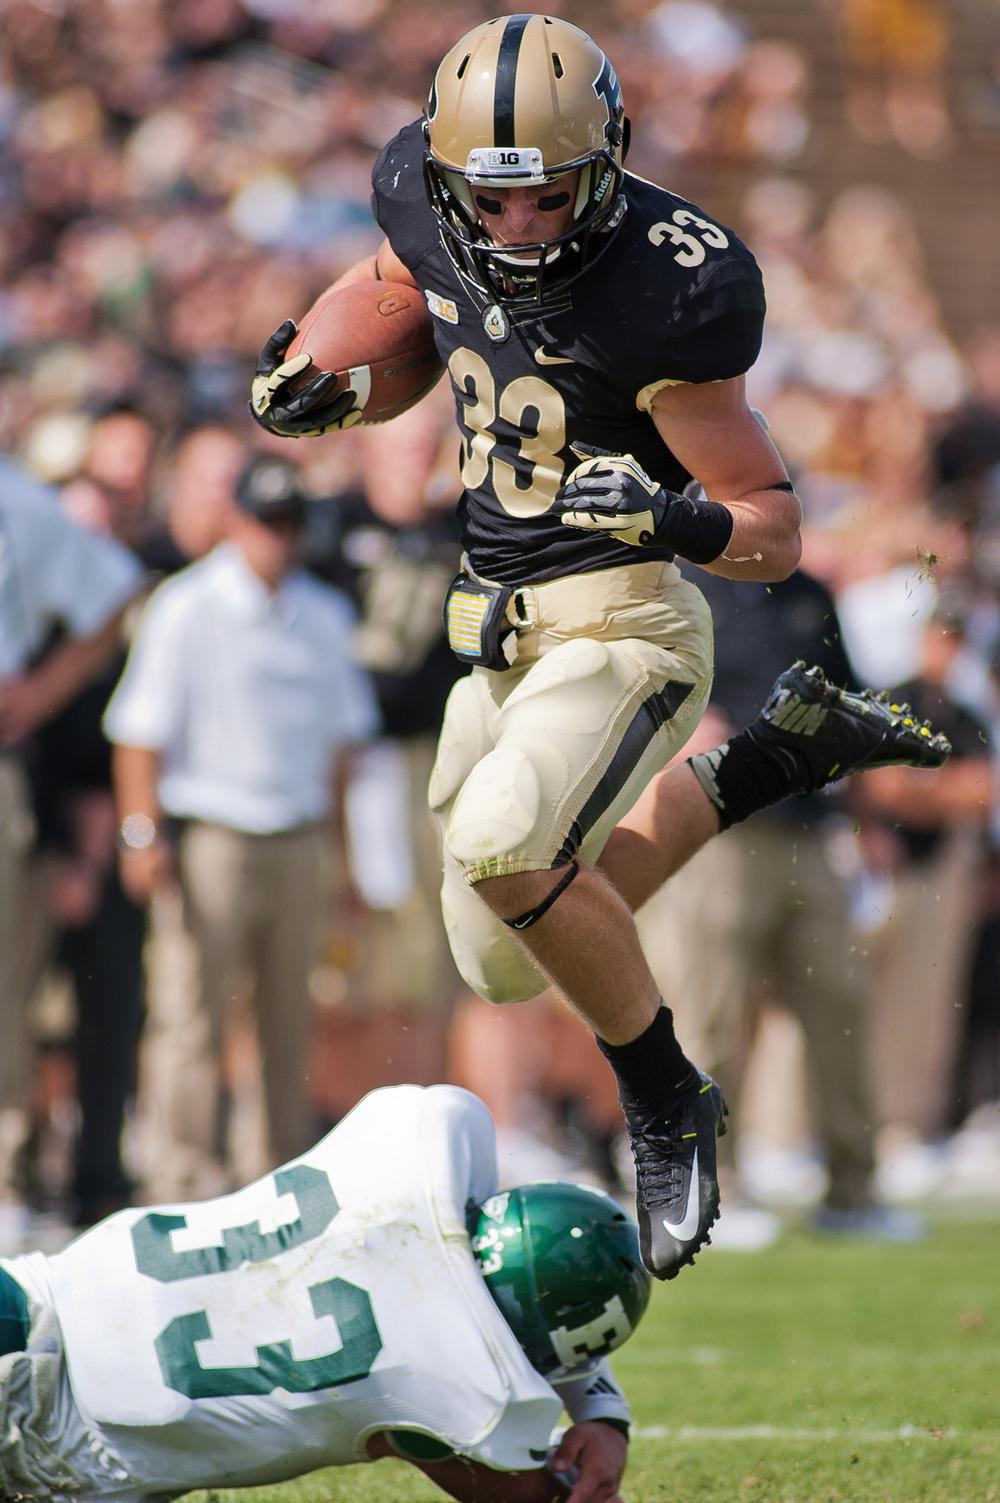 Purdue wide receiver Danny Anthrop leaps over Eastern Michigan's defense in Ross-Ade Stadium Sept. 15, 2012.